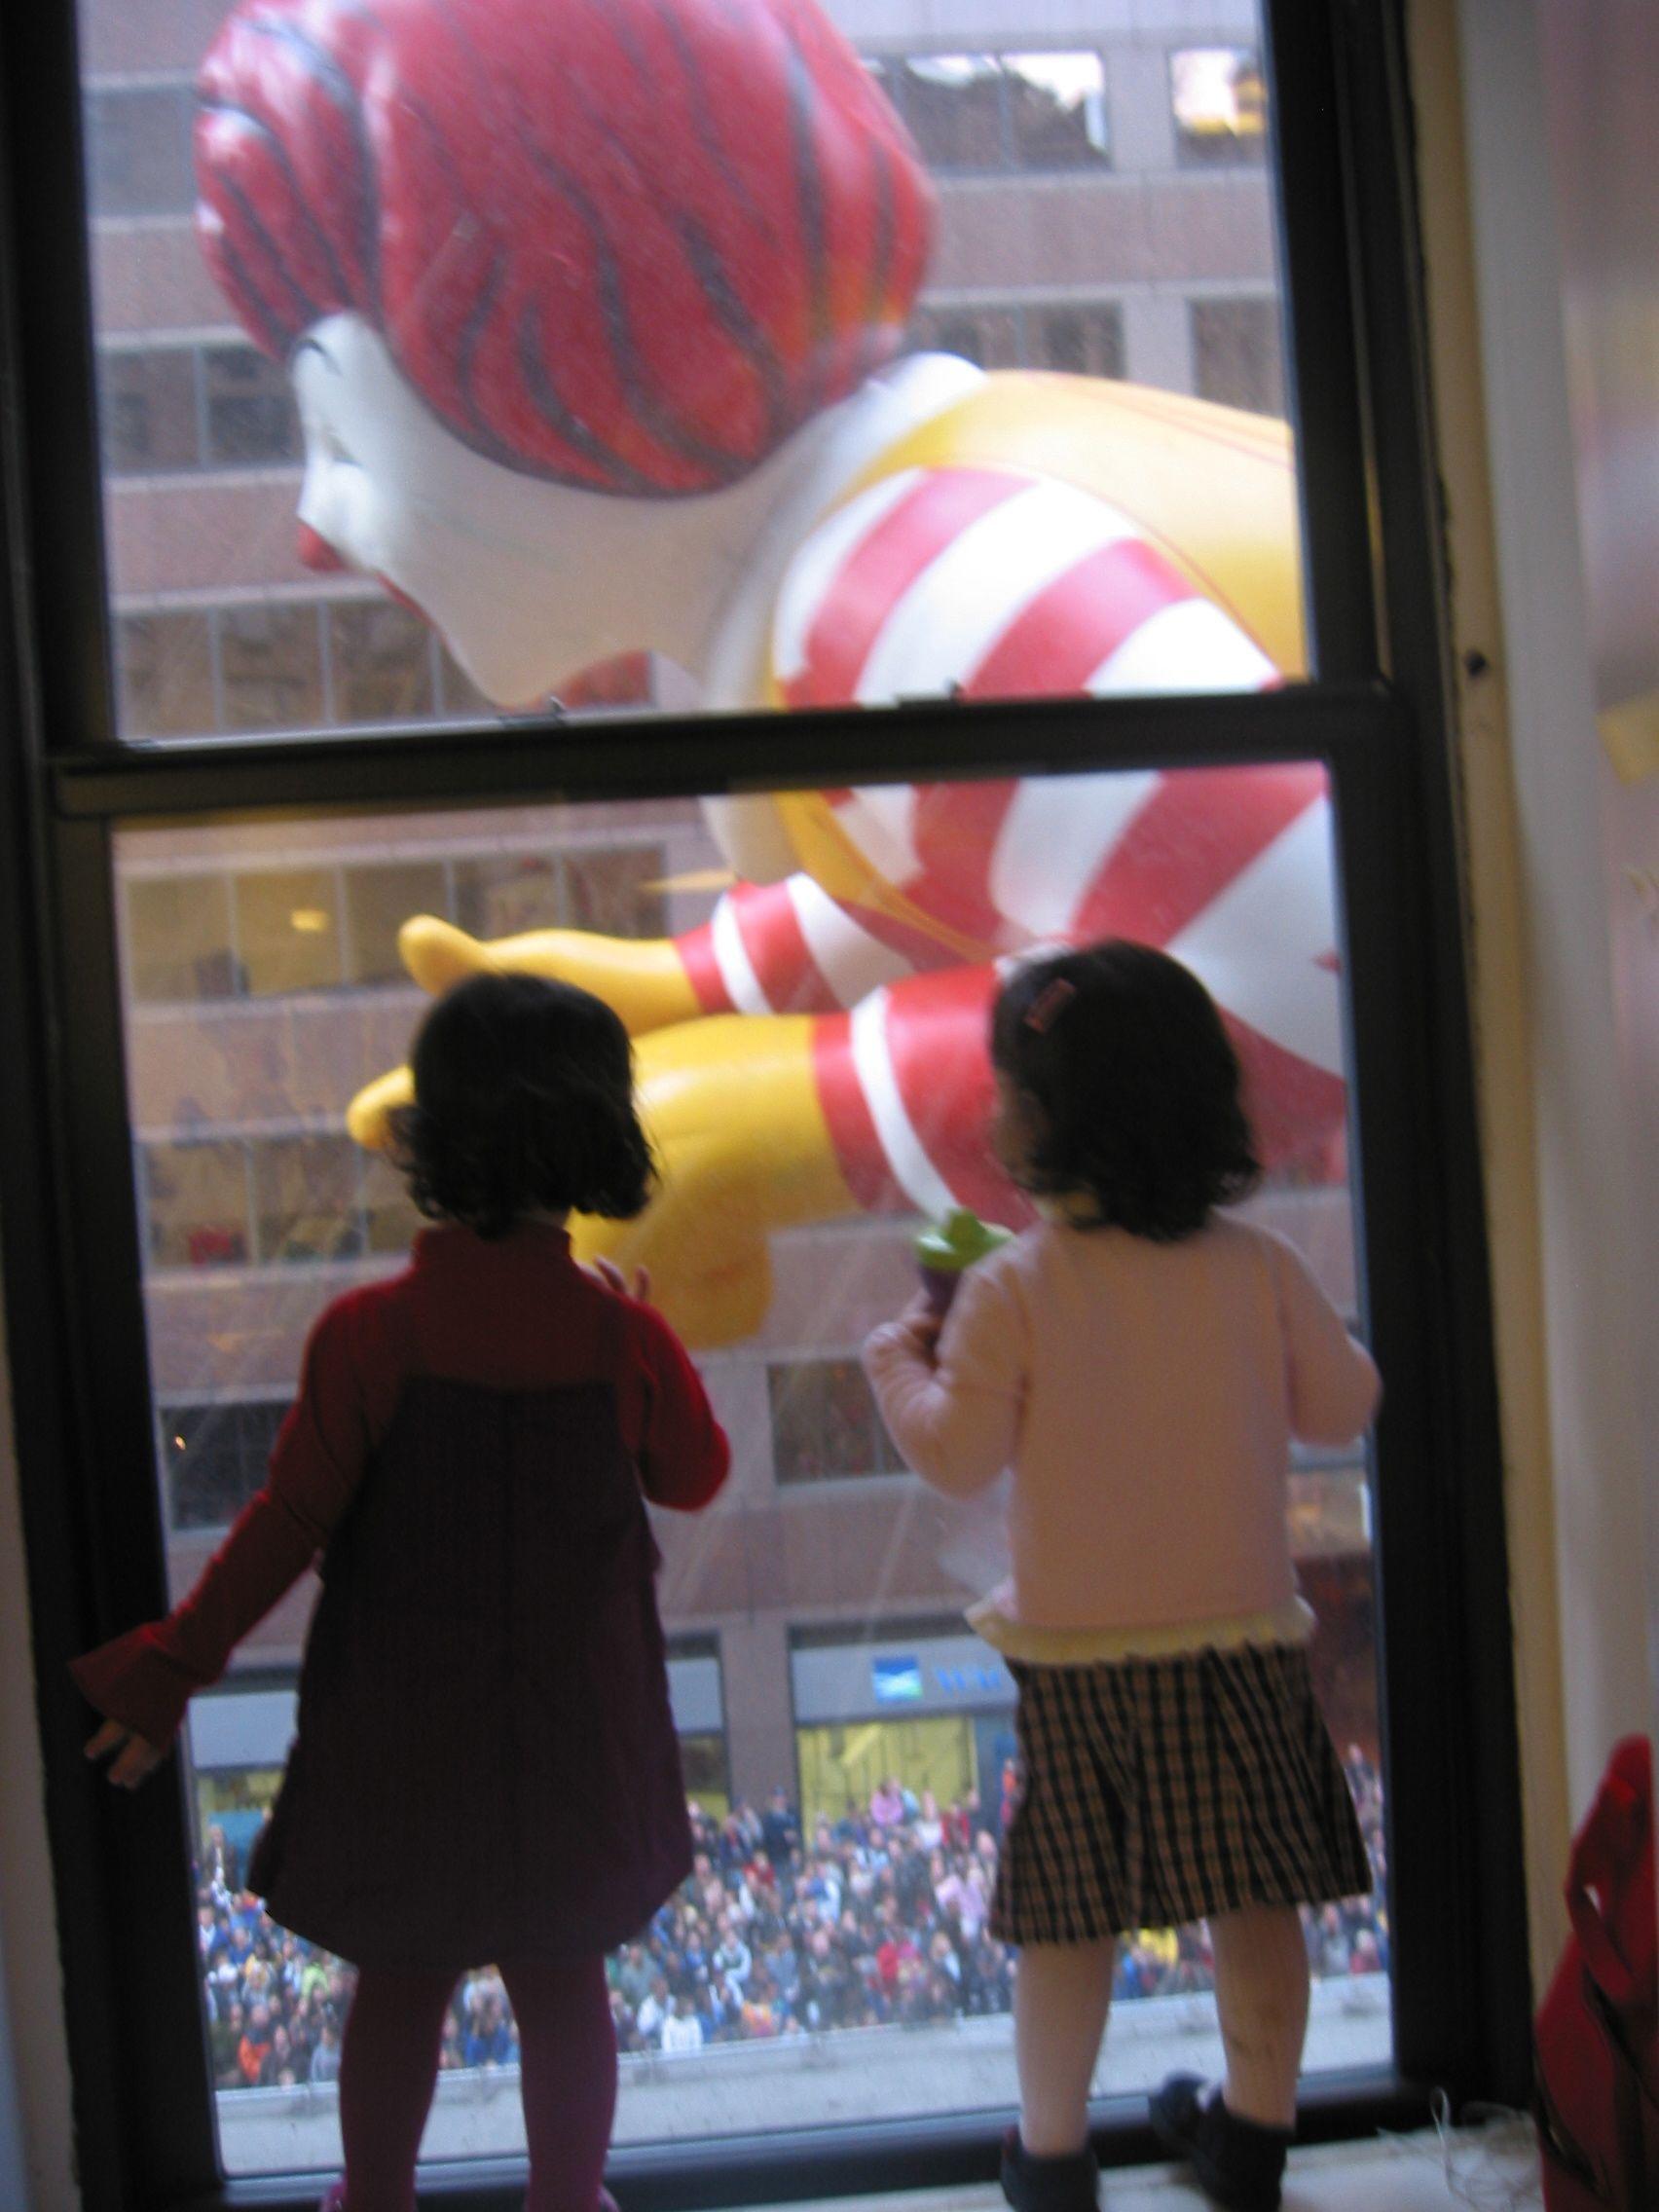 Macy's Thanksgiving Day Parade Balloon Flashback Macy's